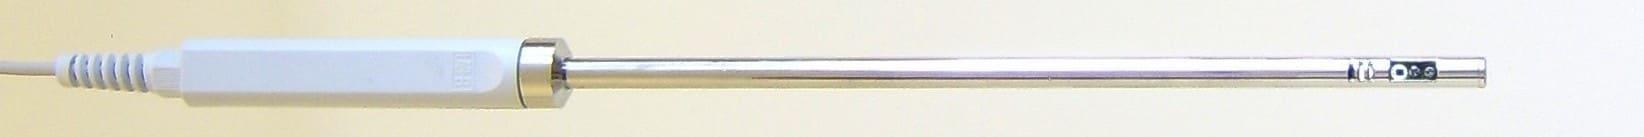 Termo-higrometr LB-583